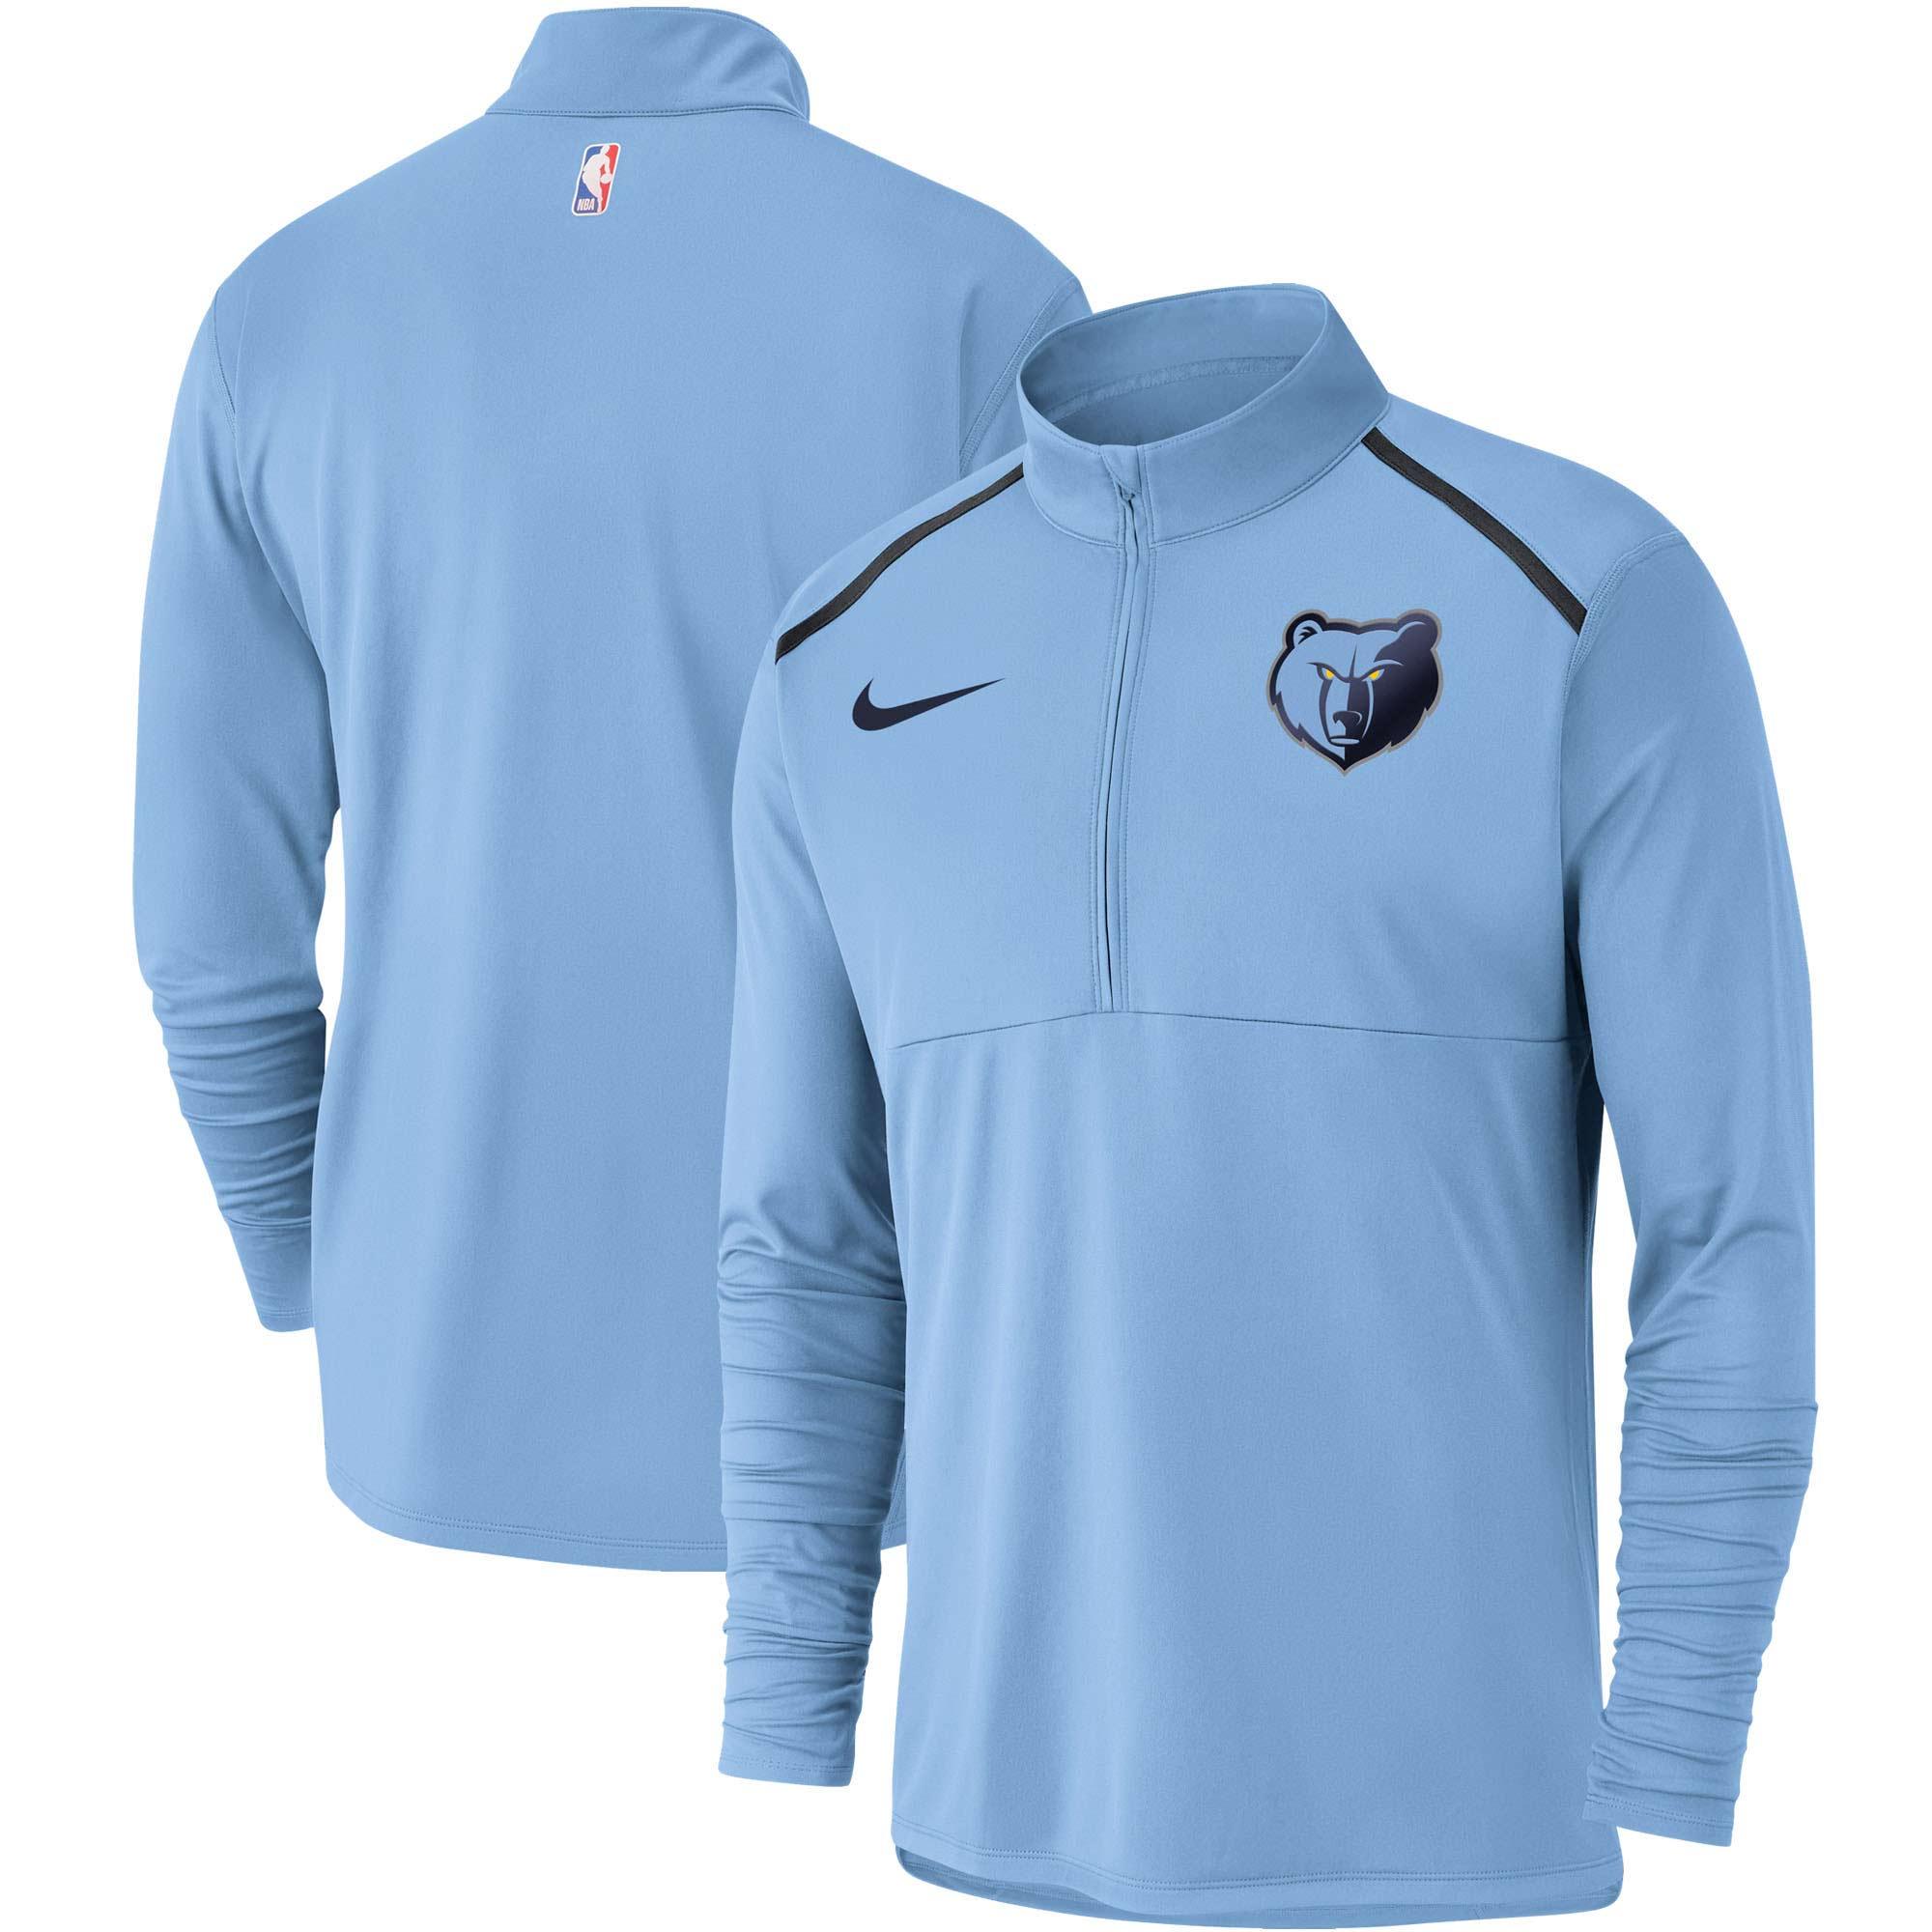 Memphis Grizzlies Nike Element Performance Half-Zip Pullover Jacket - Light Blue